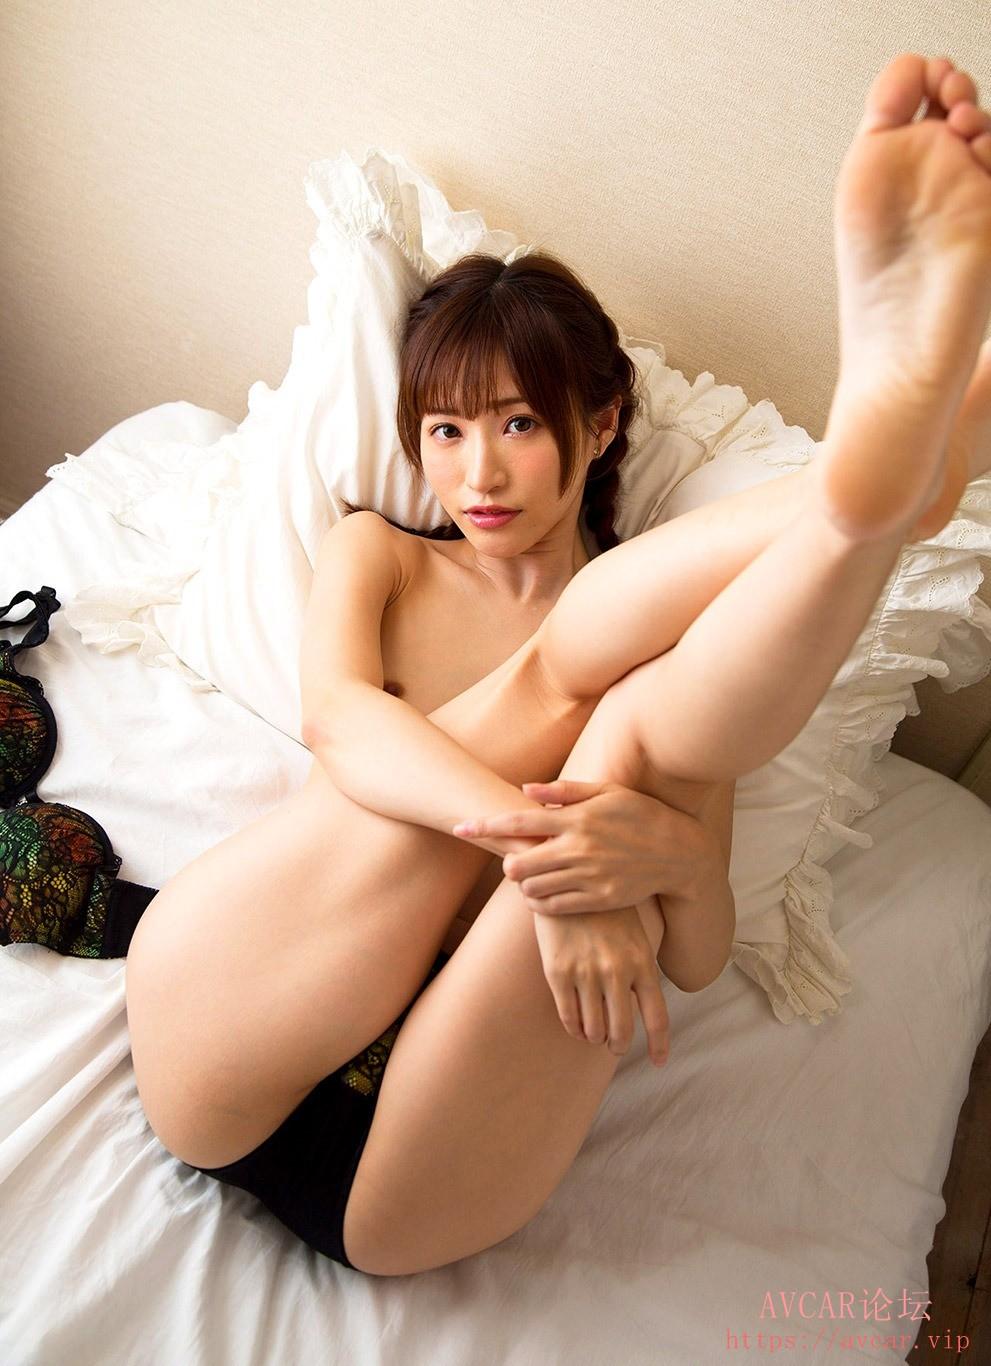 moe-amatsuka-9.jpg